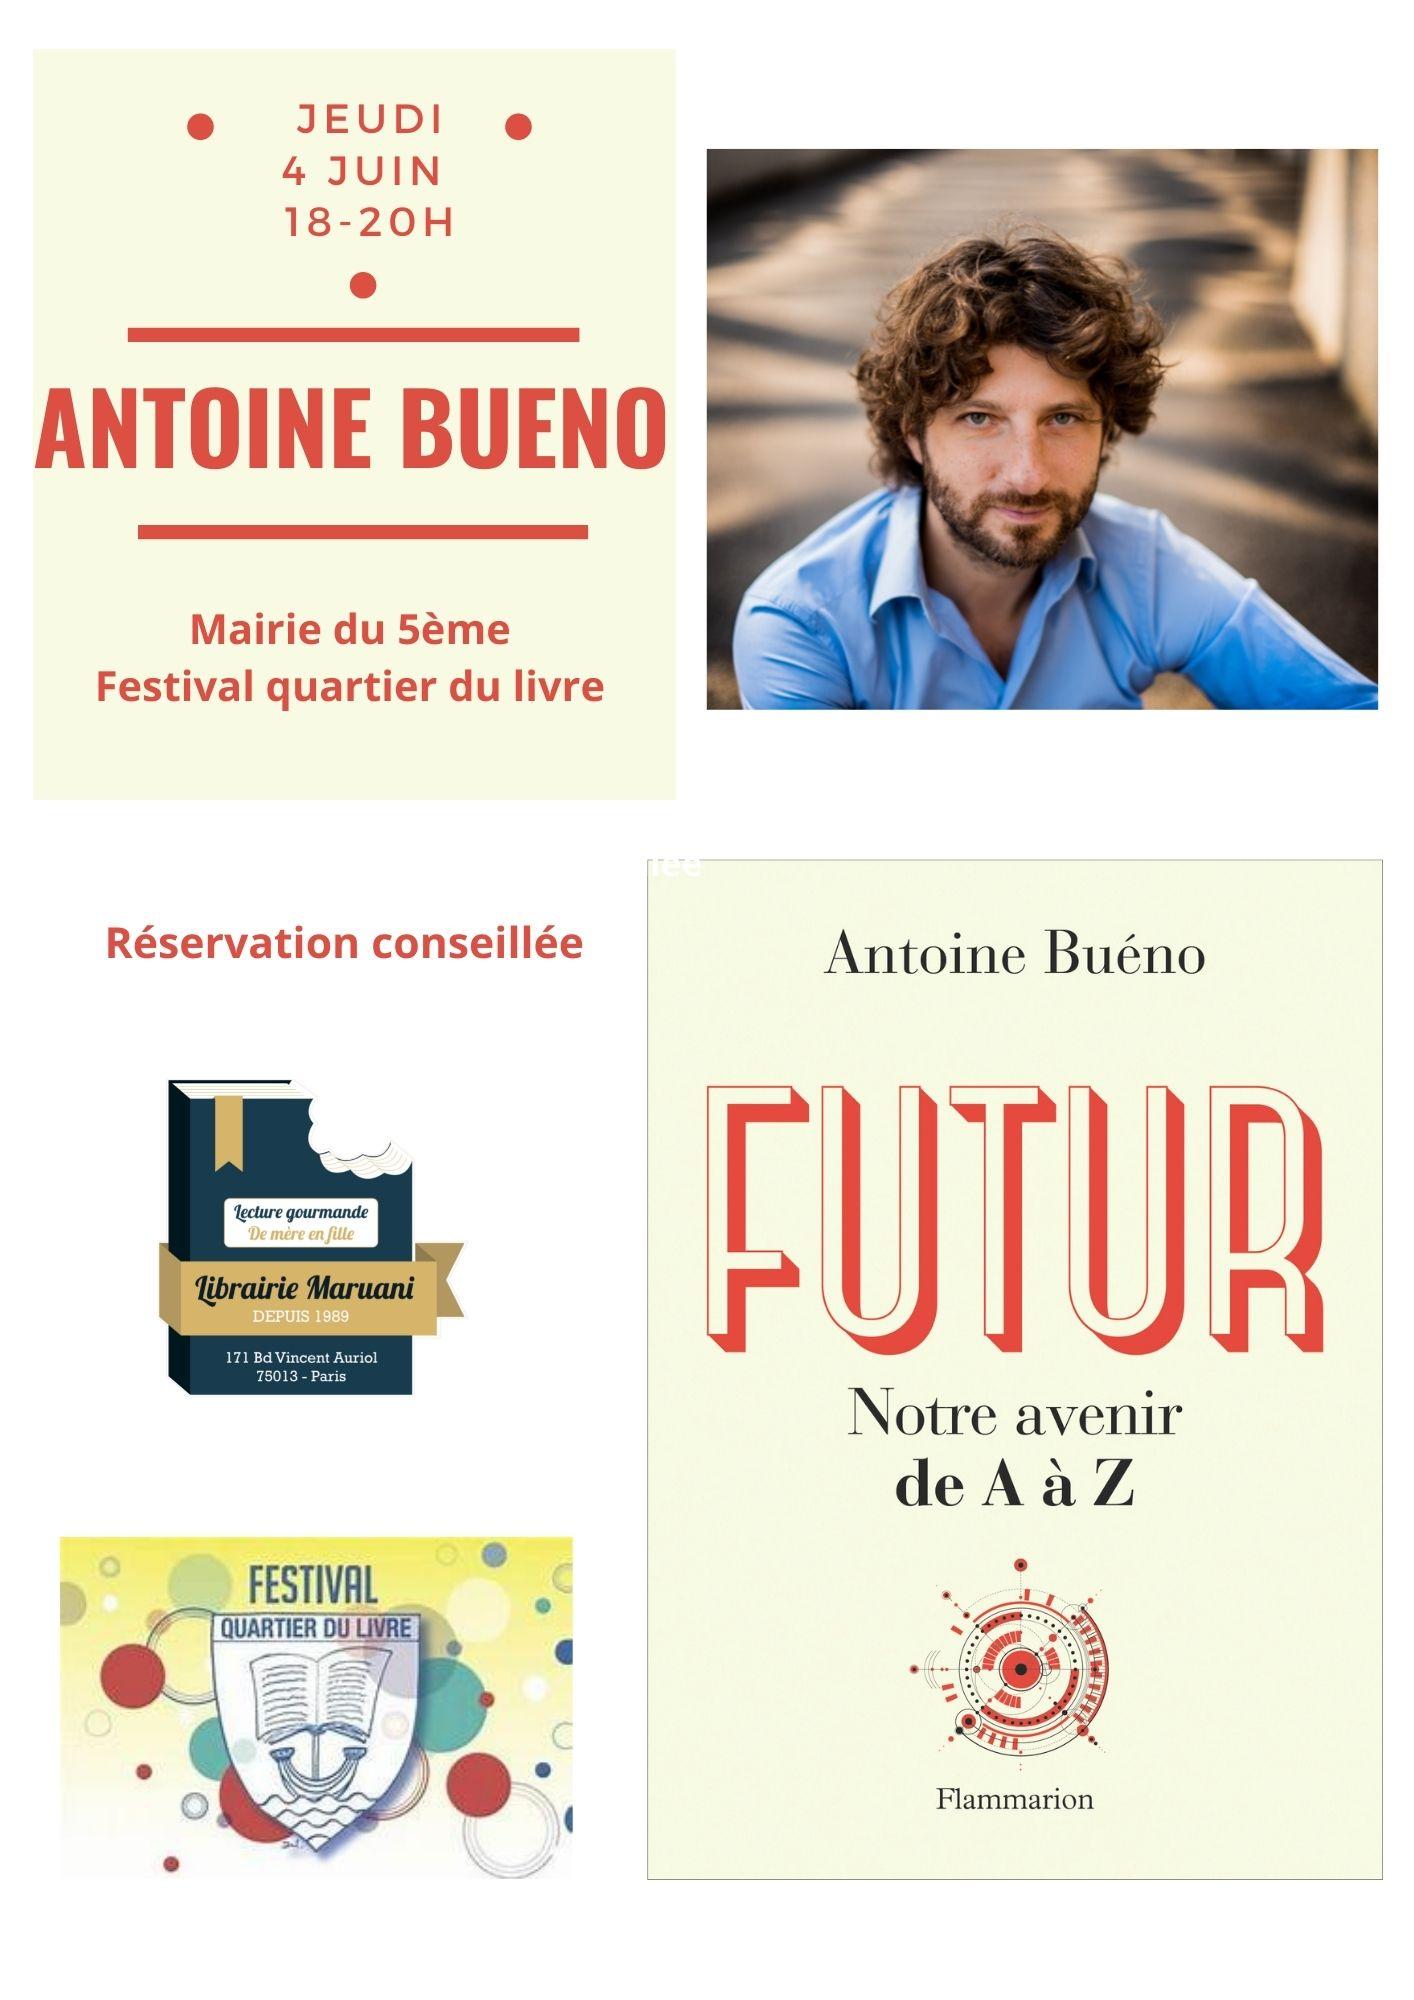 HORS LES MURS : Antoine Bueno